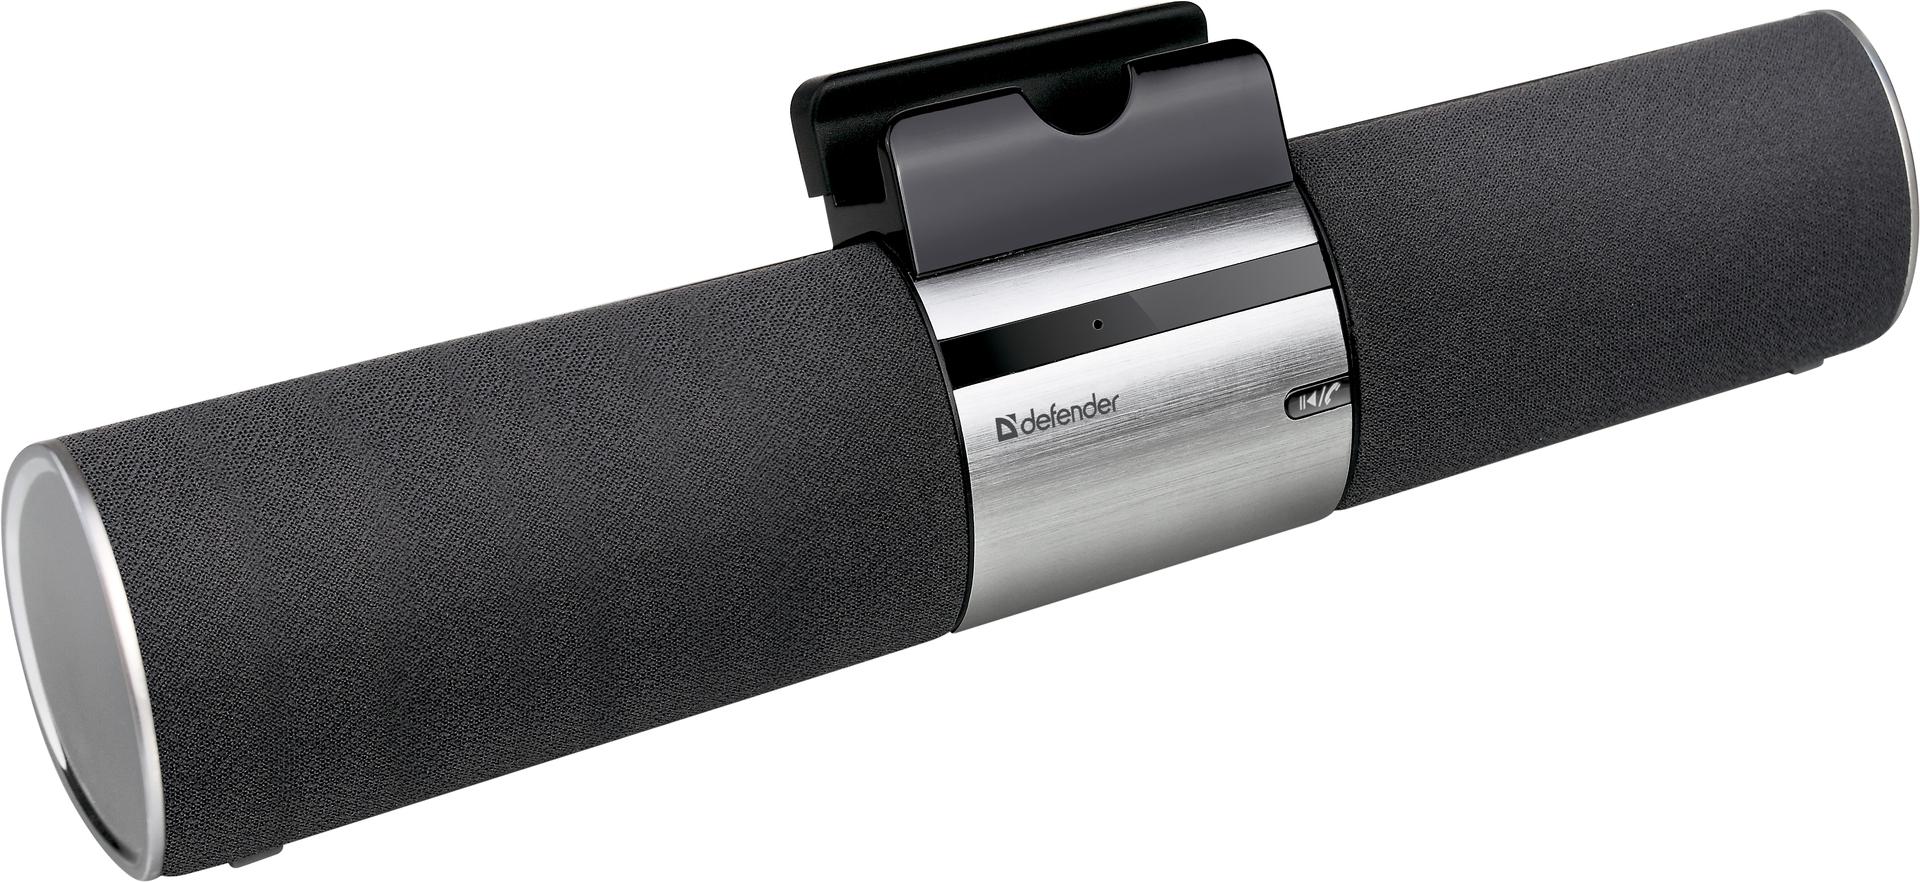 Defender E6275 Audio-S6 Black BT